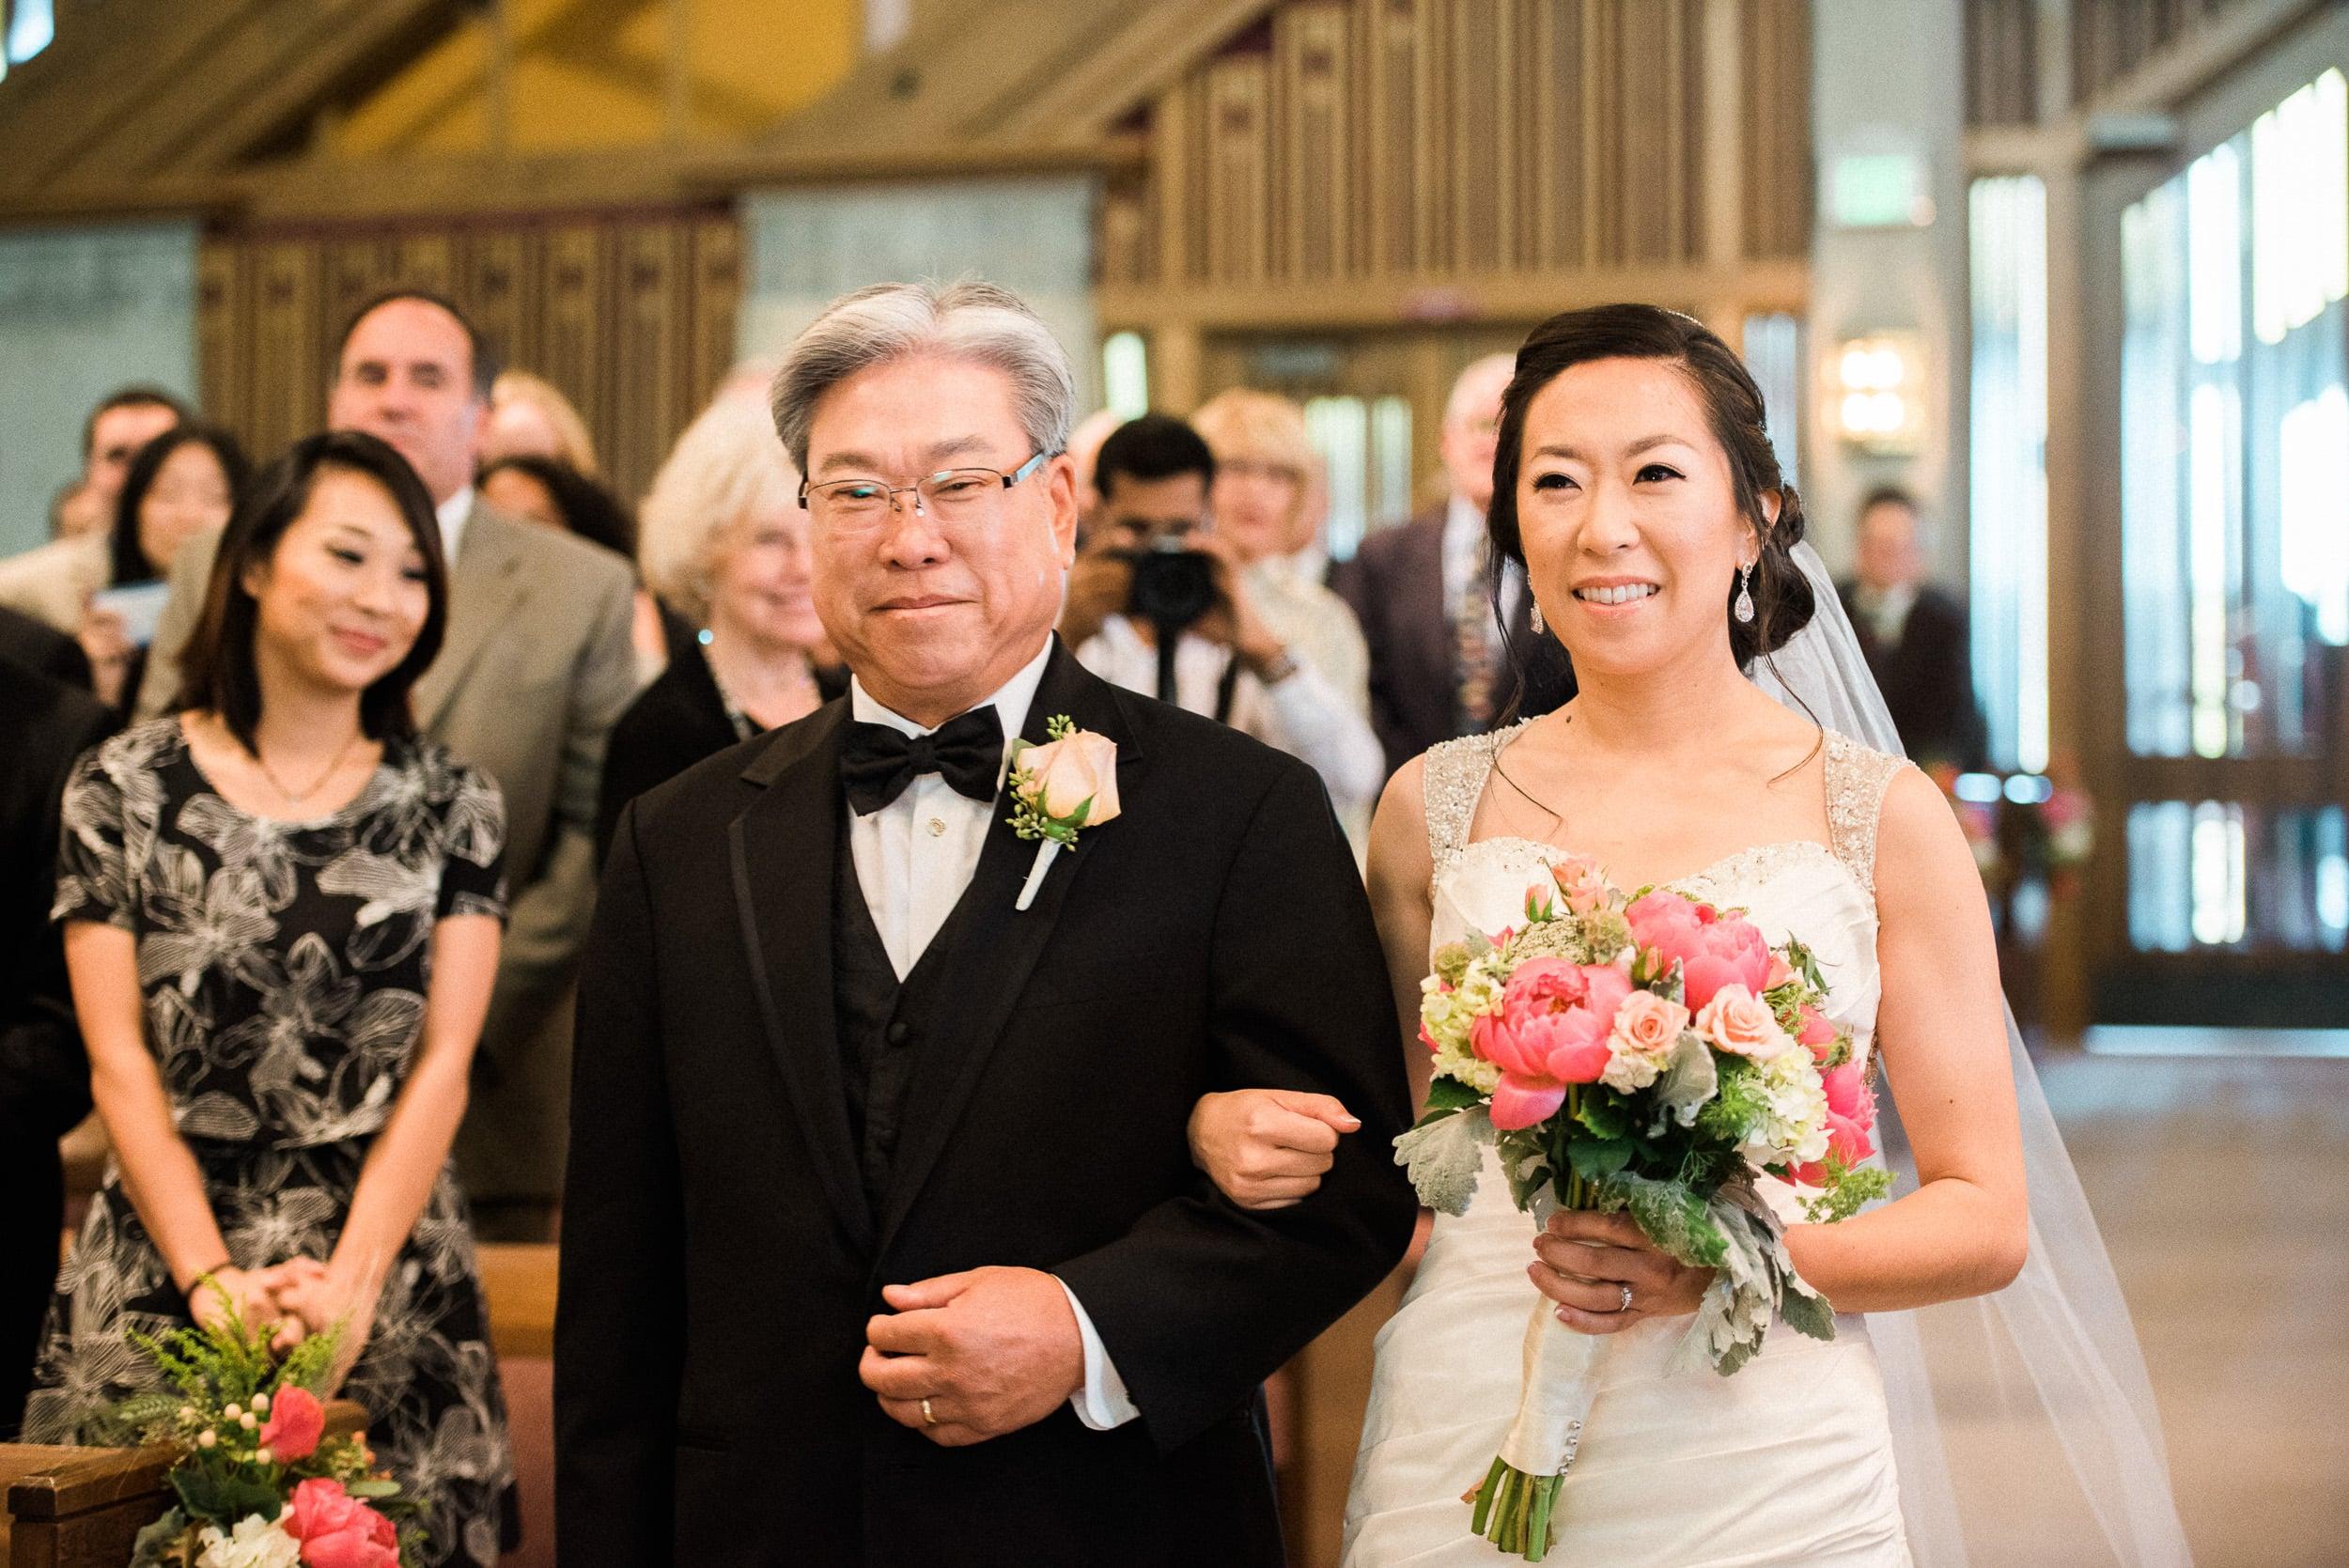 Moraga Valley Church wedding 034.jpg